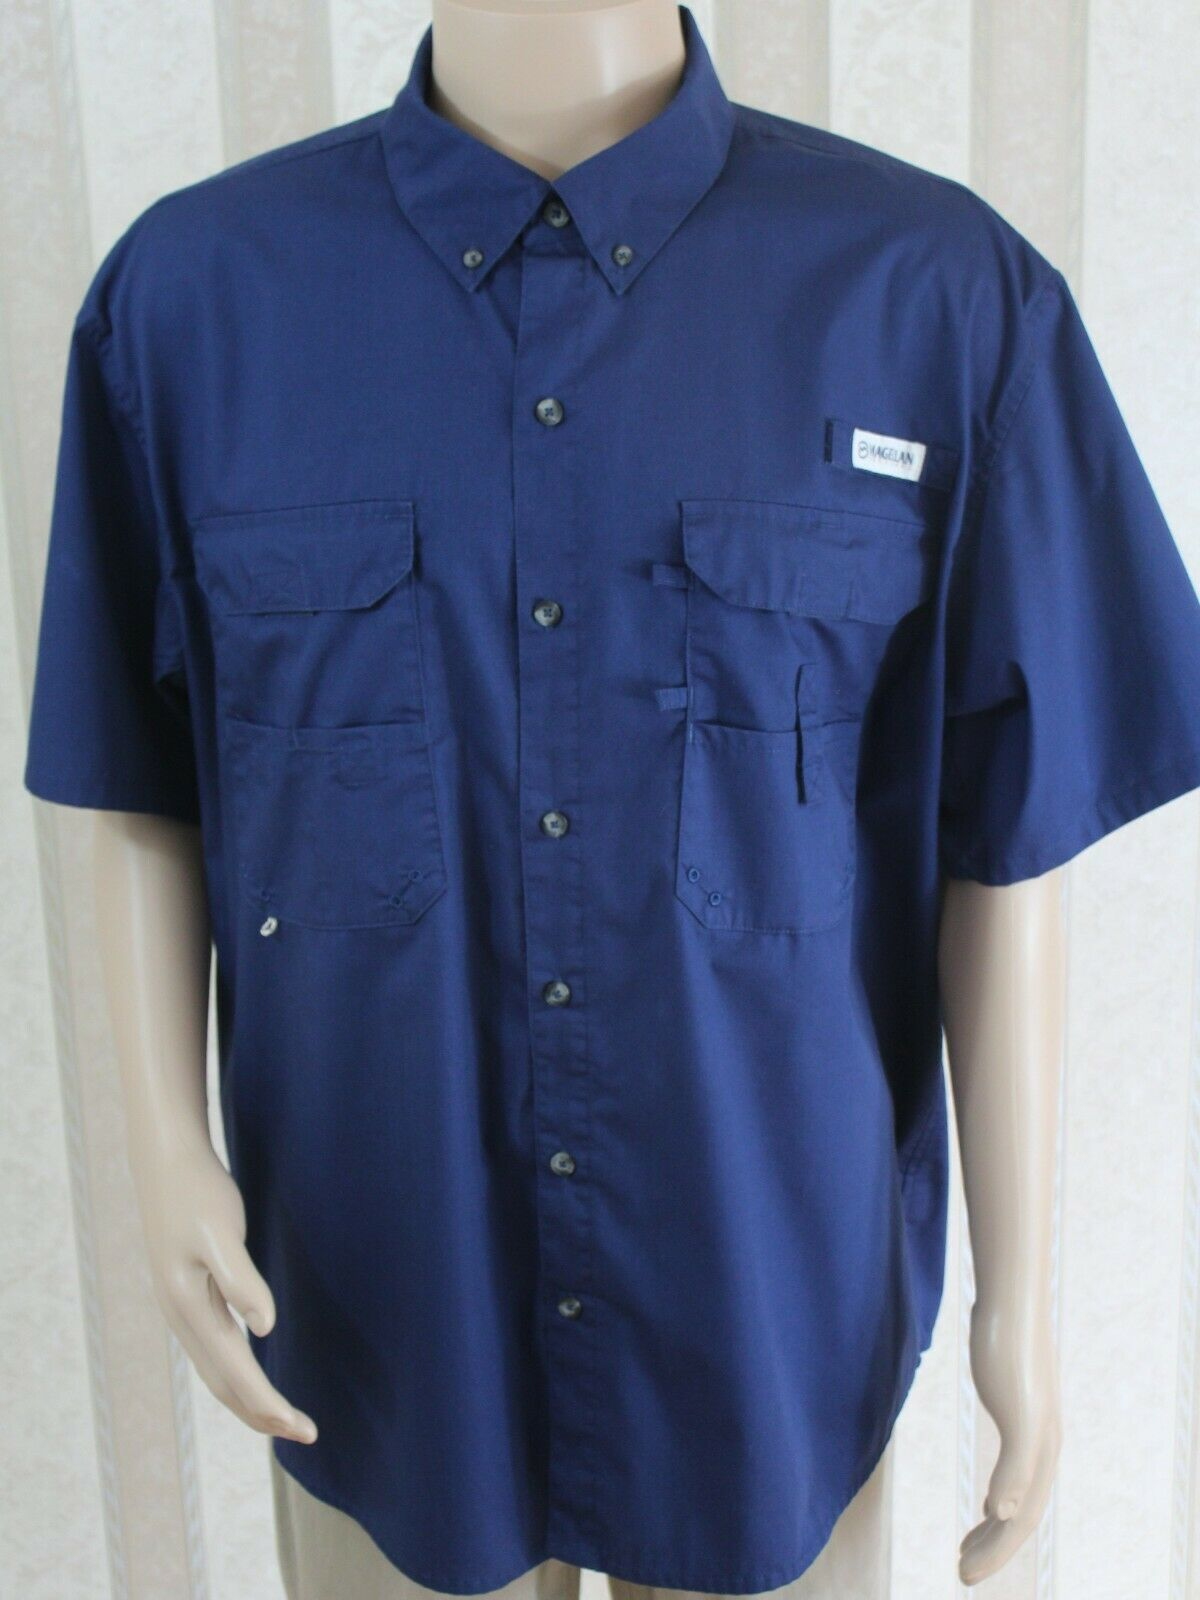 Lot of 3 MAGELLAN Outdoors Sportswear Men's XL Angler Fit Button Down Shirts EUC